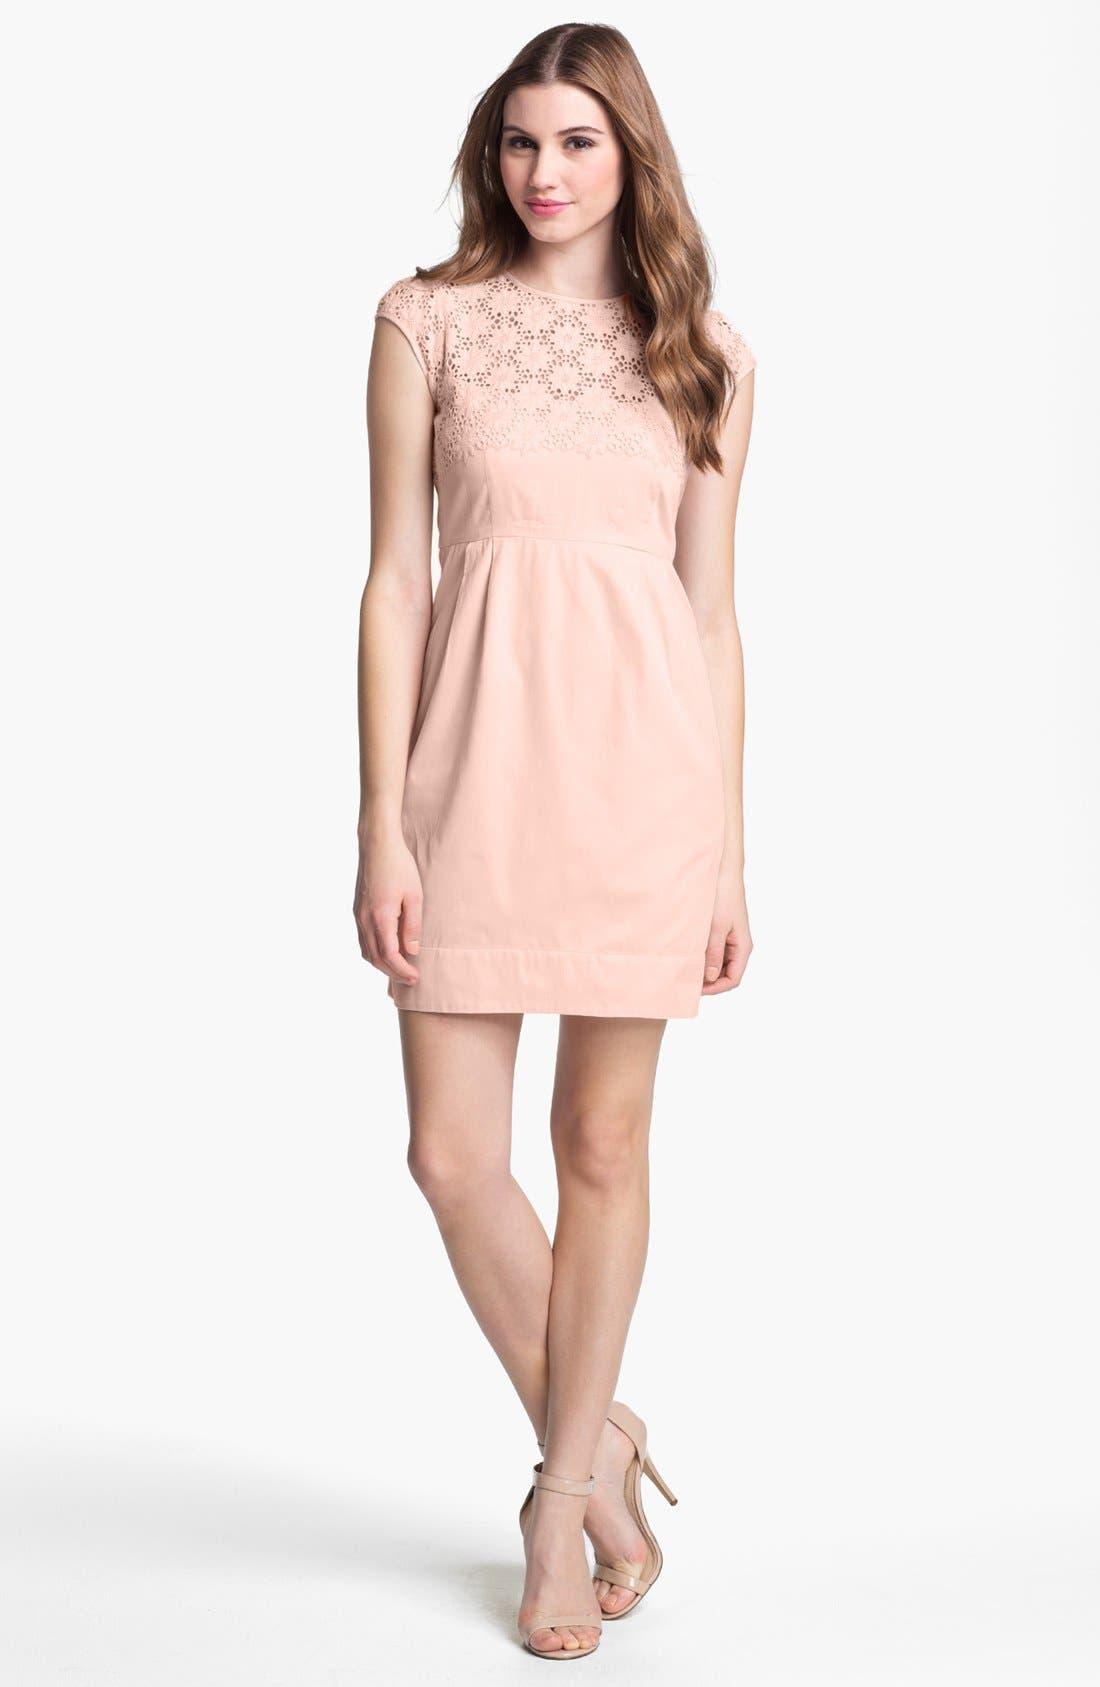 Main Image - French Connection 'Creamy' Embroidered Yoke Sheath Dress